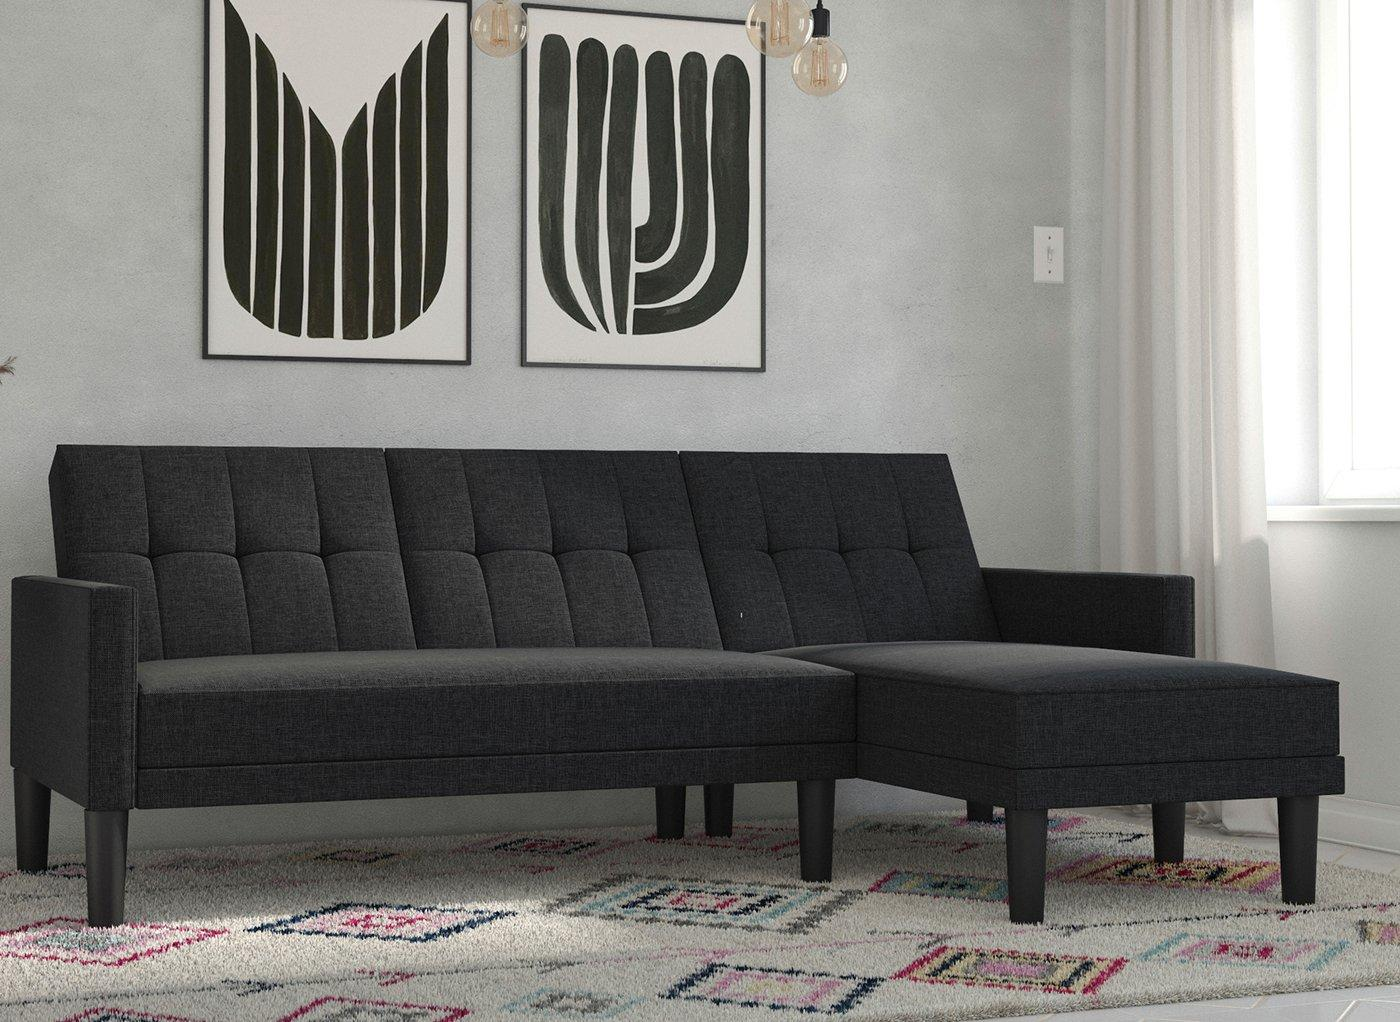 Valentina 3 Seater Corner Sofa Bed - Dark grey